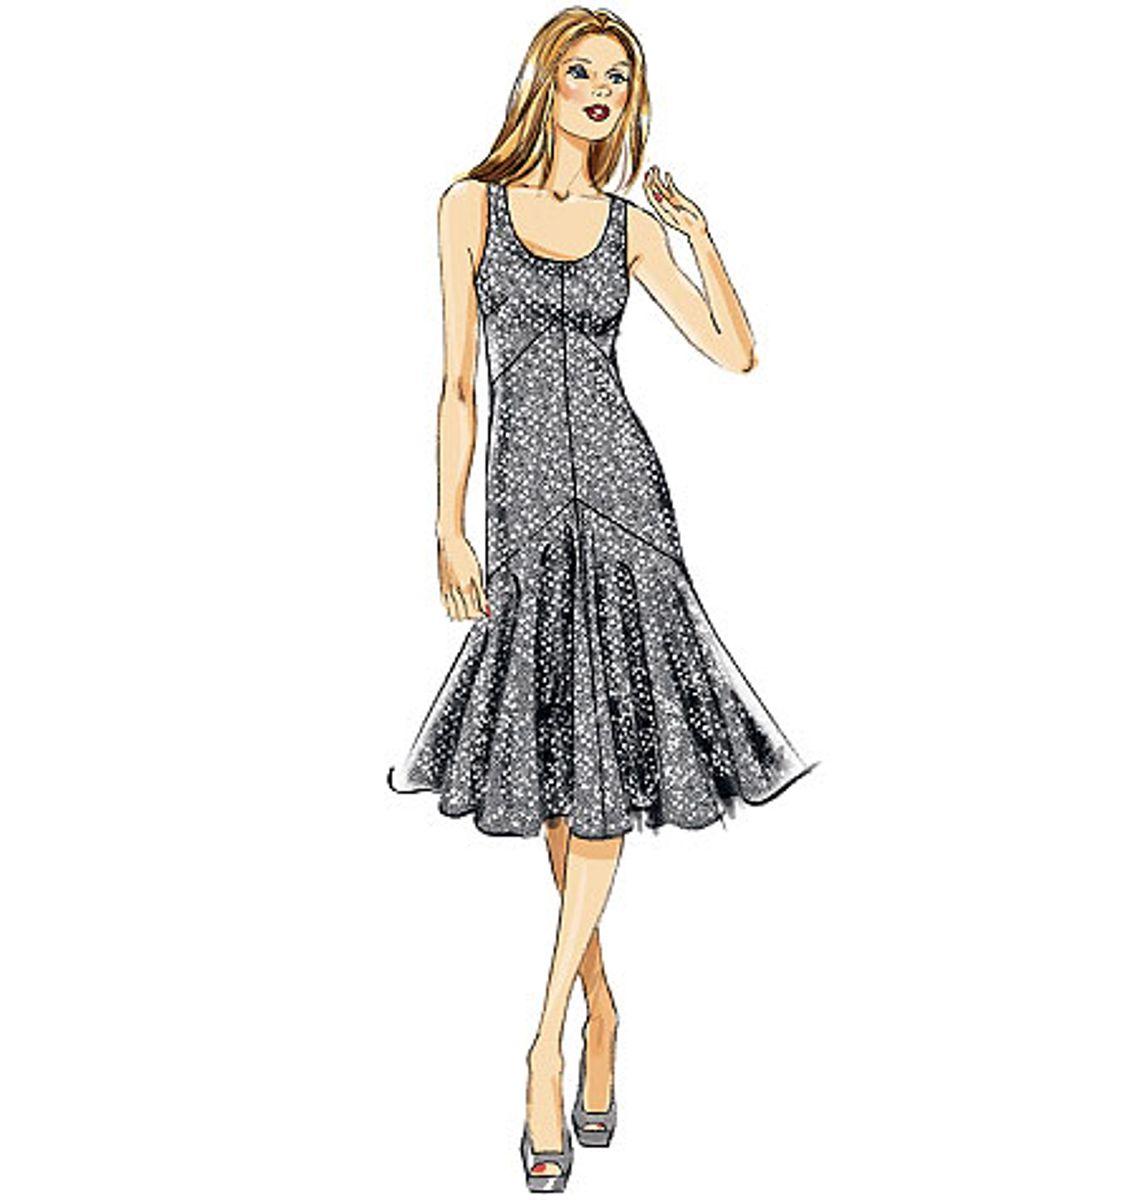 Patron de robe - Vogue 8814